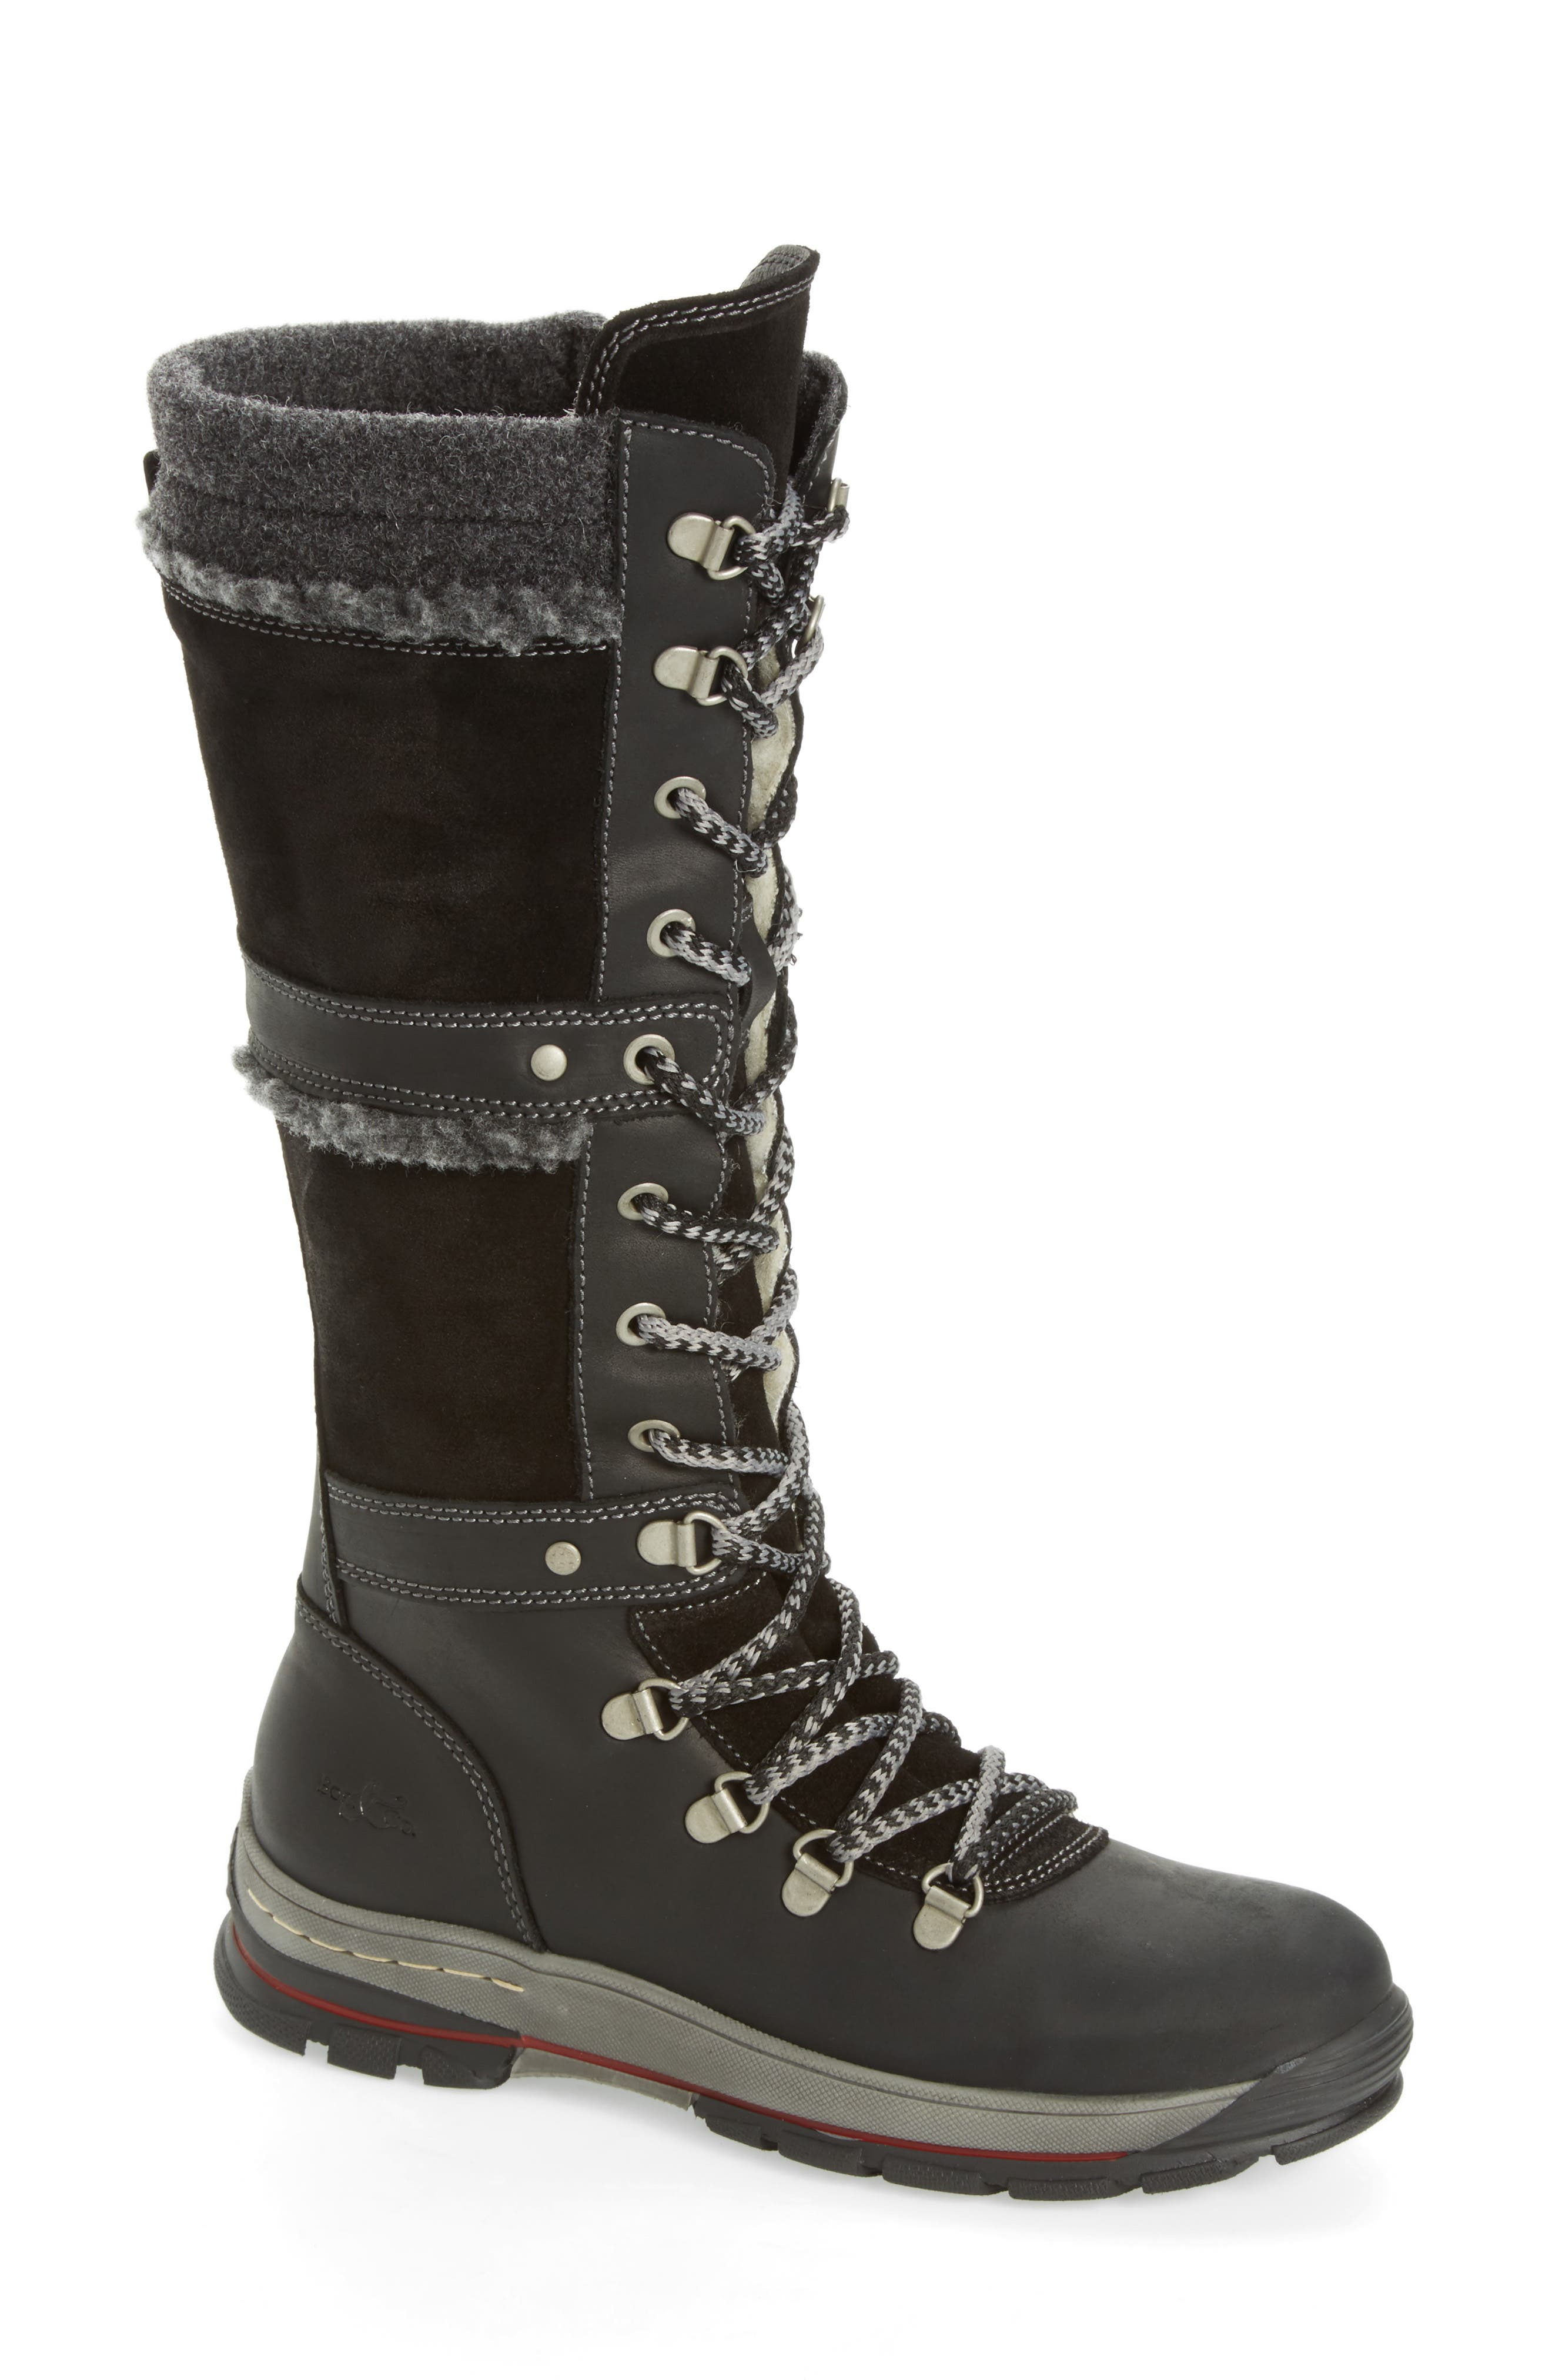 Gabriella Waterproof Boot,                             Main thumbnail 1, color,                             Black/ Dark Grey